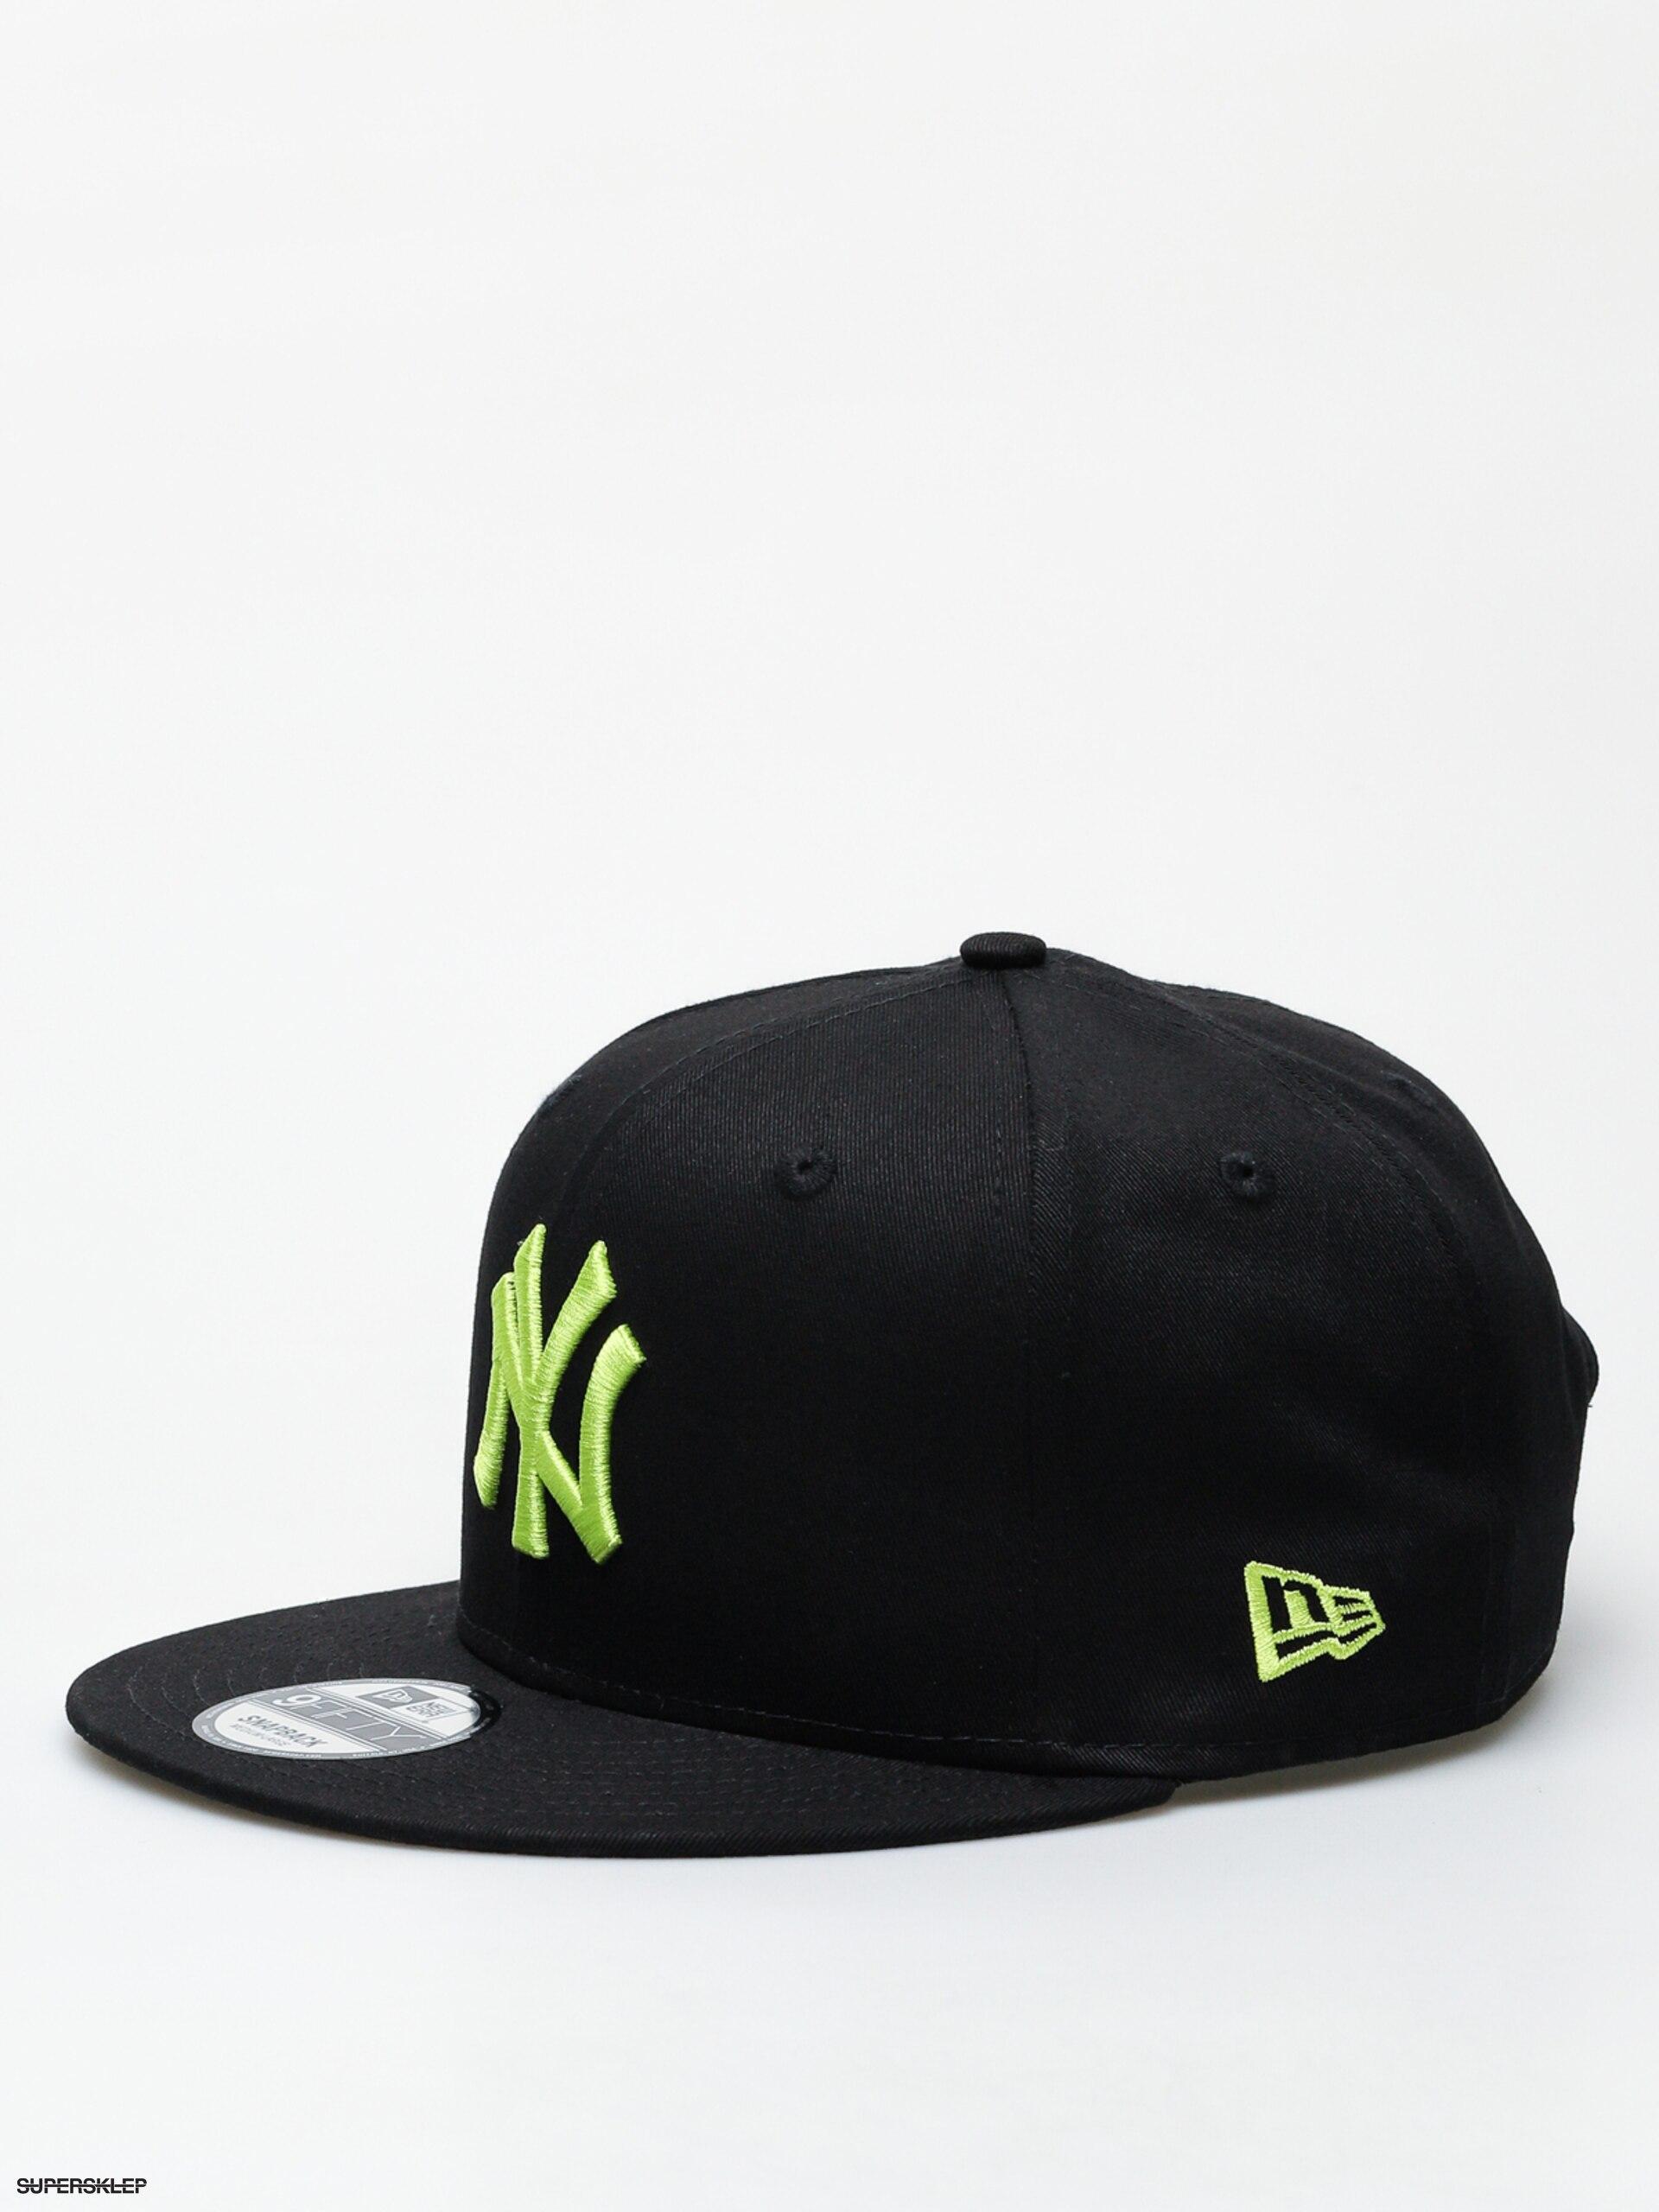 7d2adb4e9 Šiltovka New Era 9Fifty League Essential New York Yankees ZD (black/cyber  green)